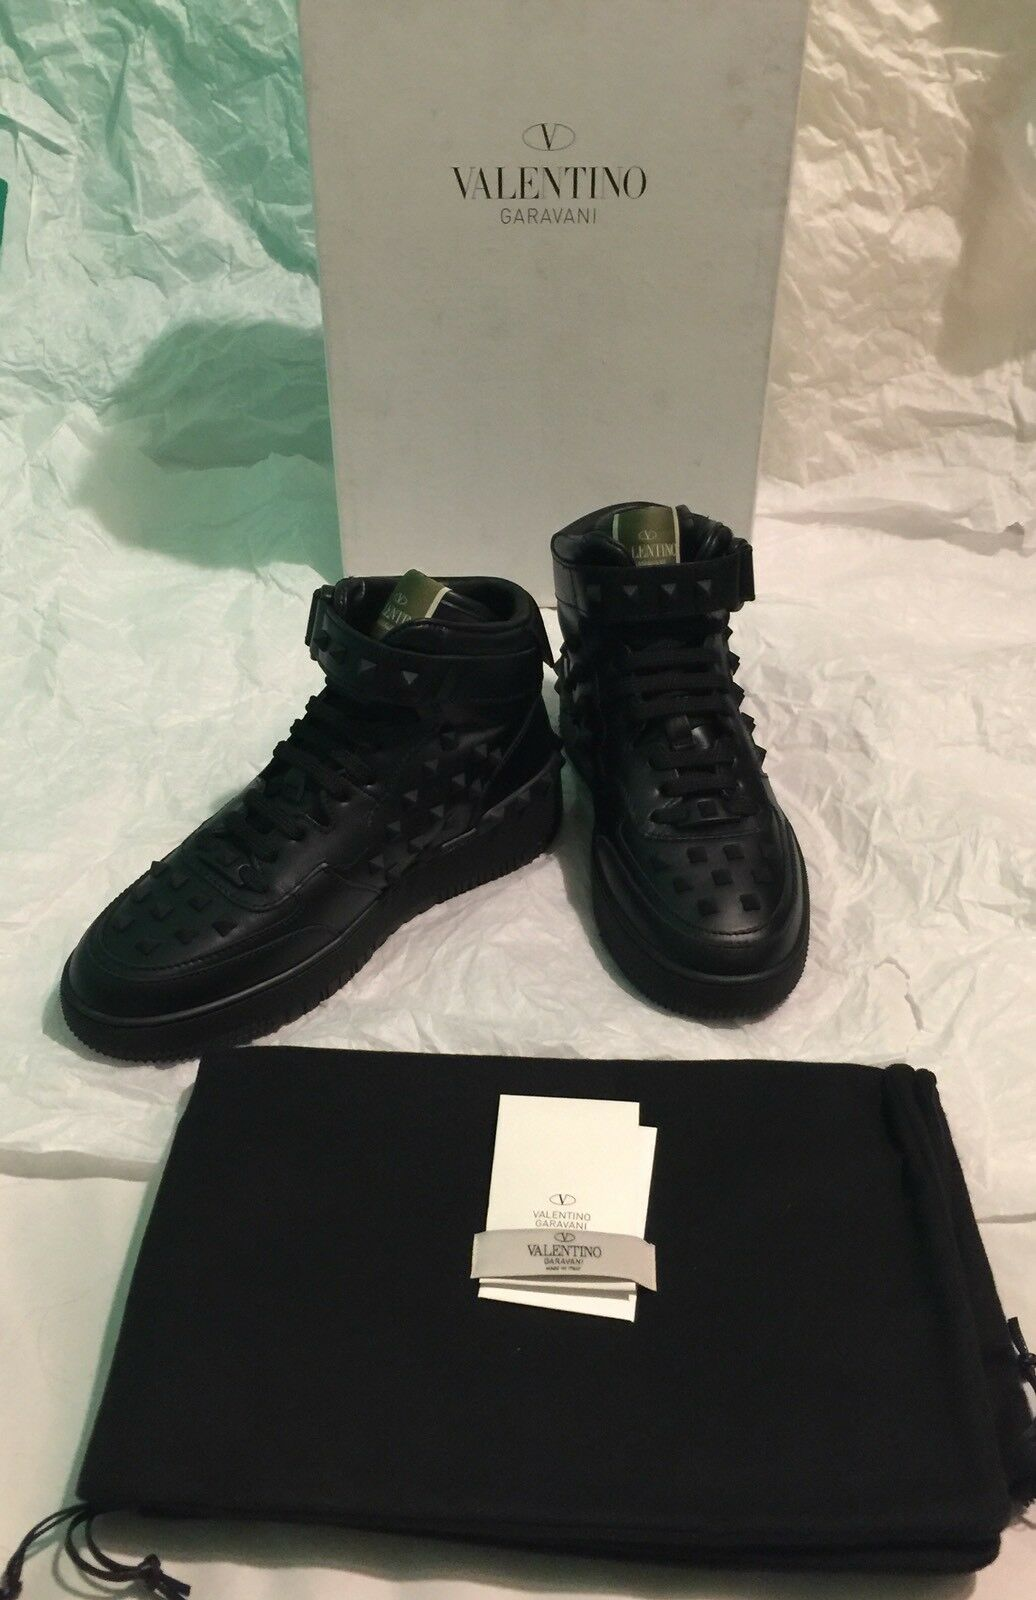 [NEW WITH BOX, RARE] Valentino Garavani Studded Leather Hi Top Sneaker US Men 7